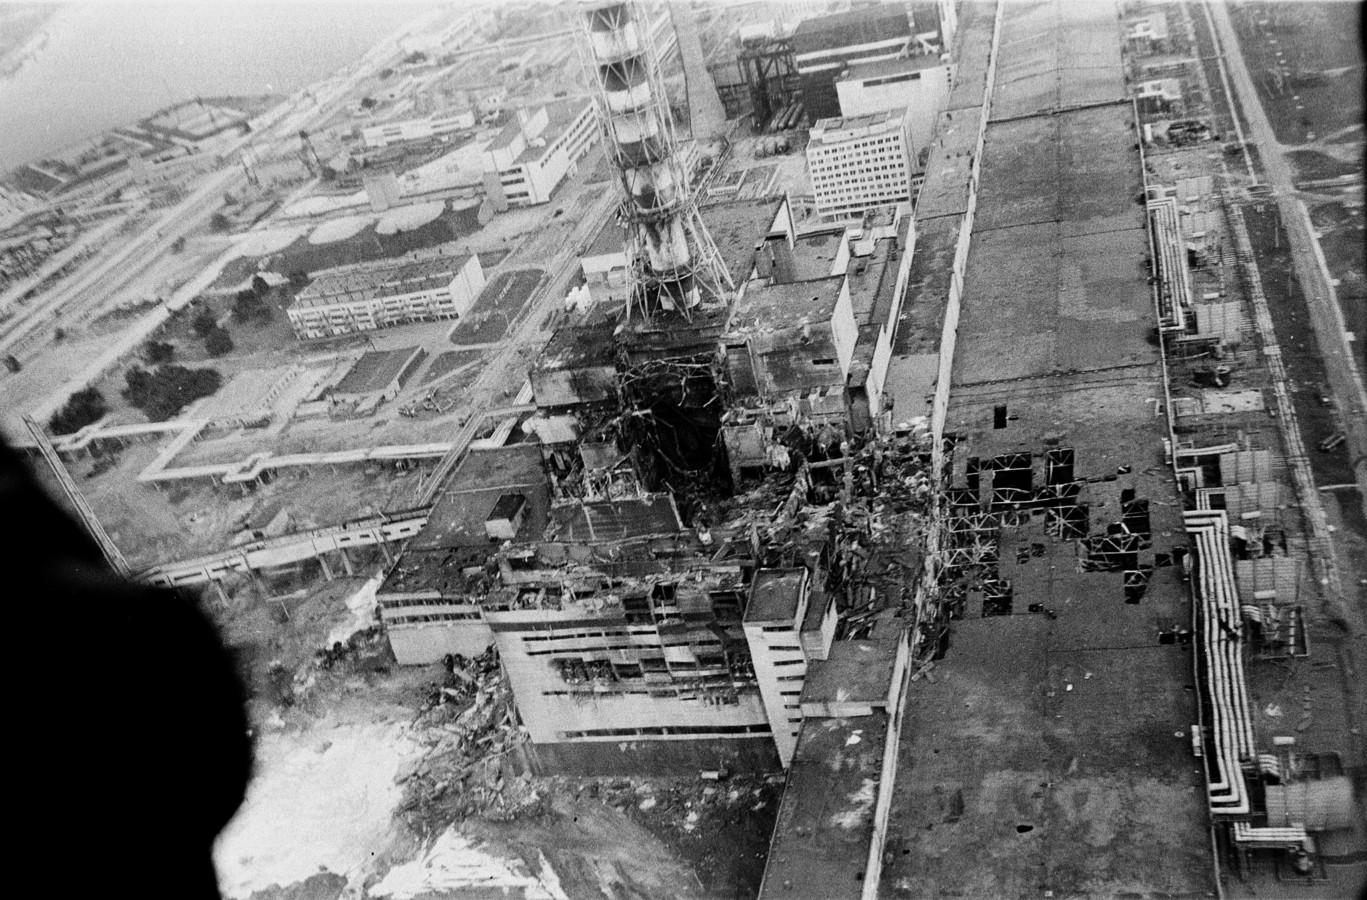 De kerncentrale van Tsjernobyl.